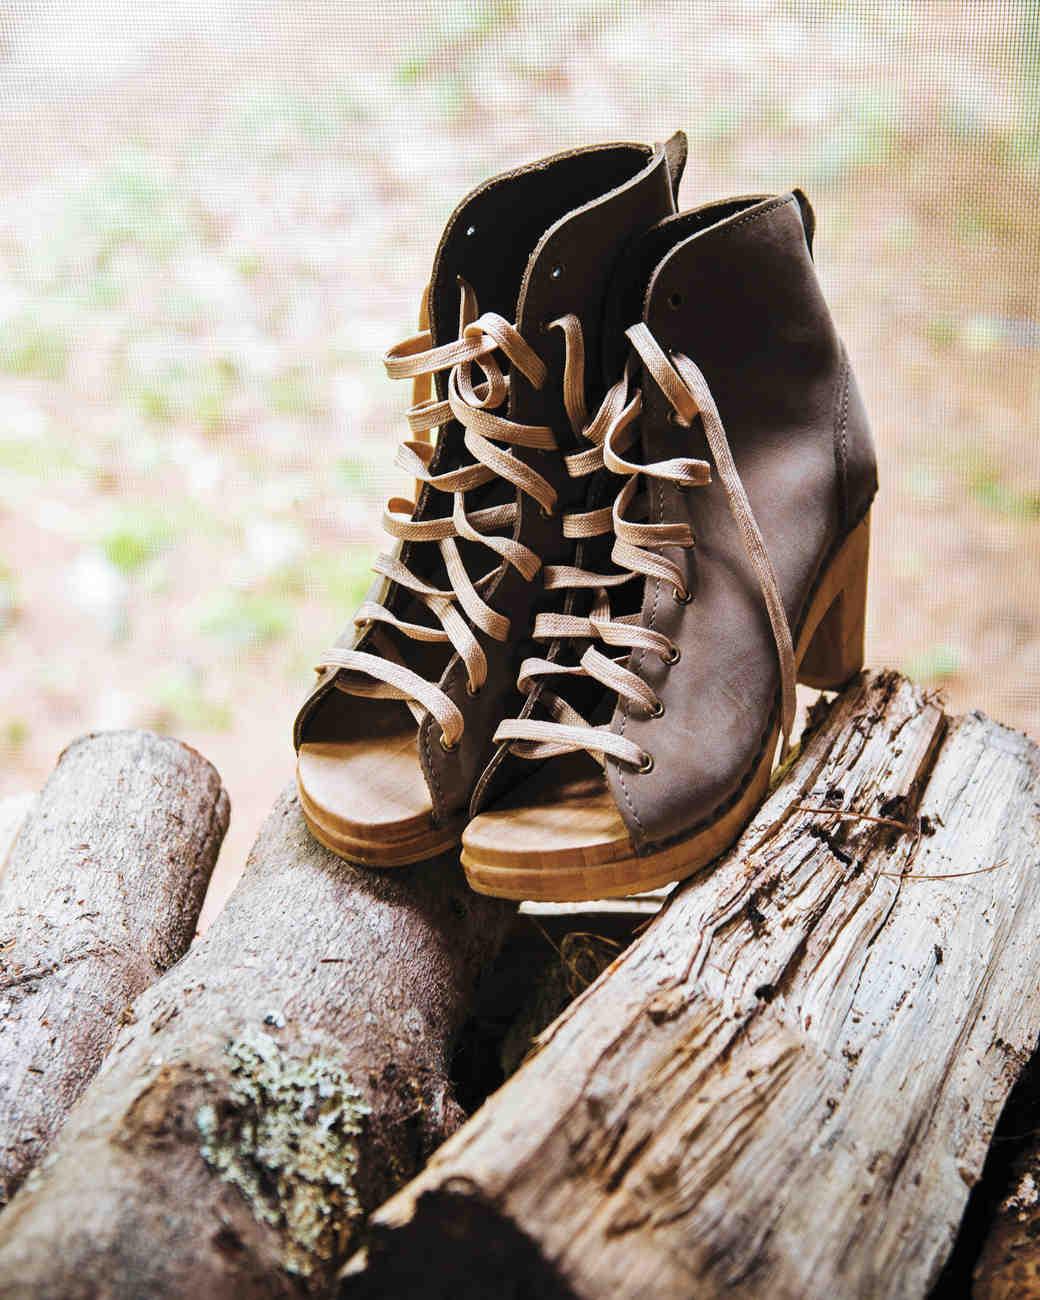 teresa-pepin-tp-163-shoes-s111105.jpg